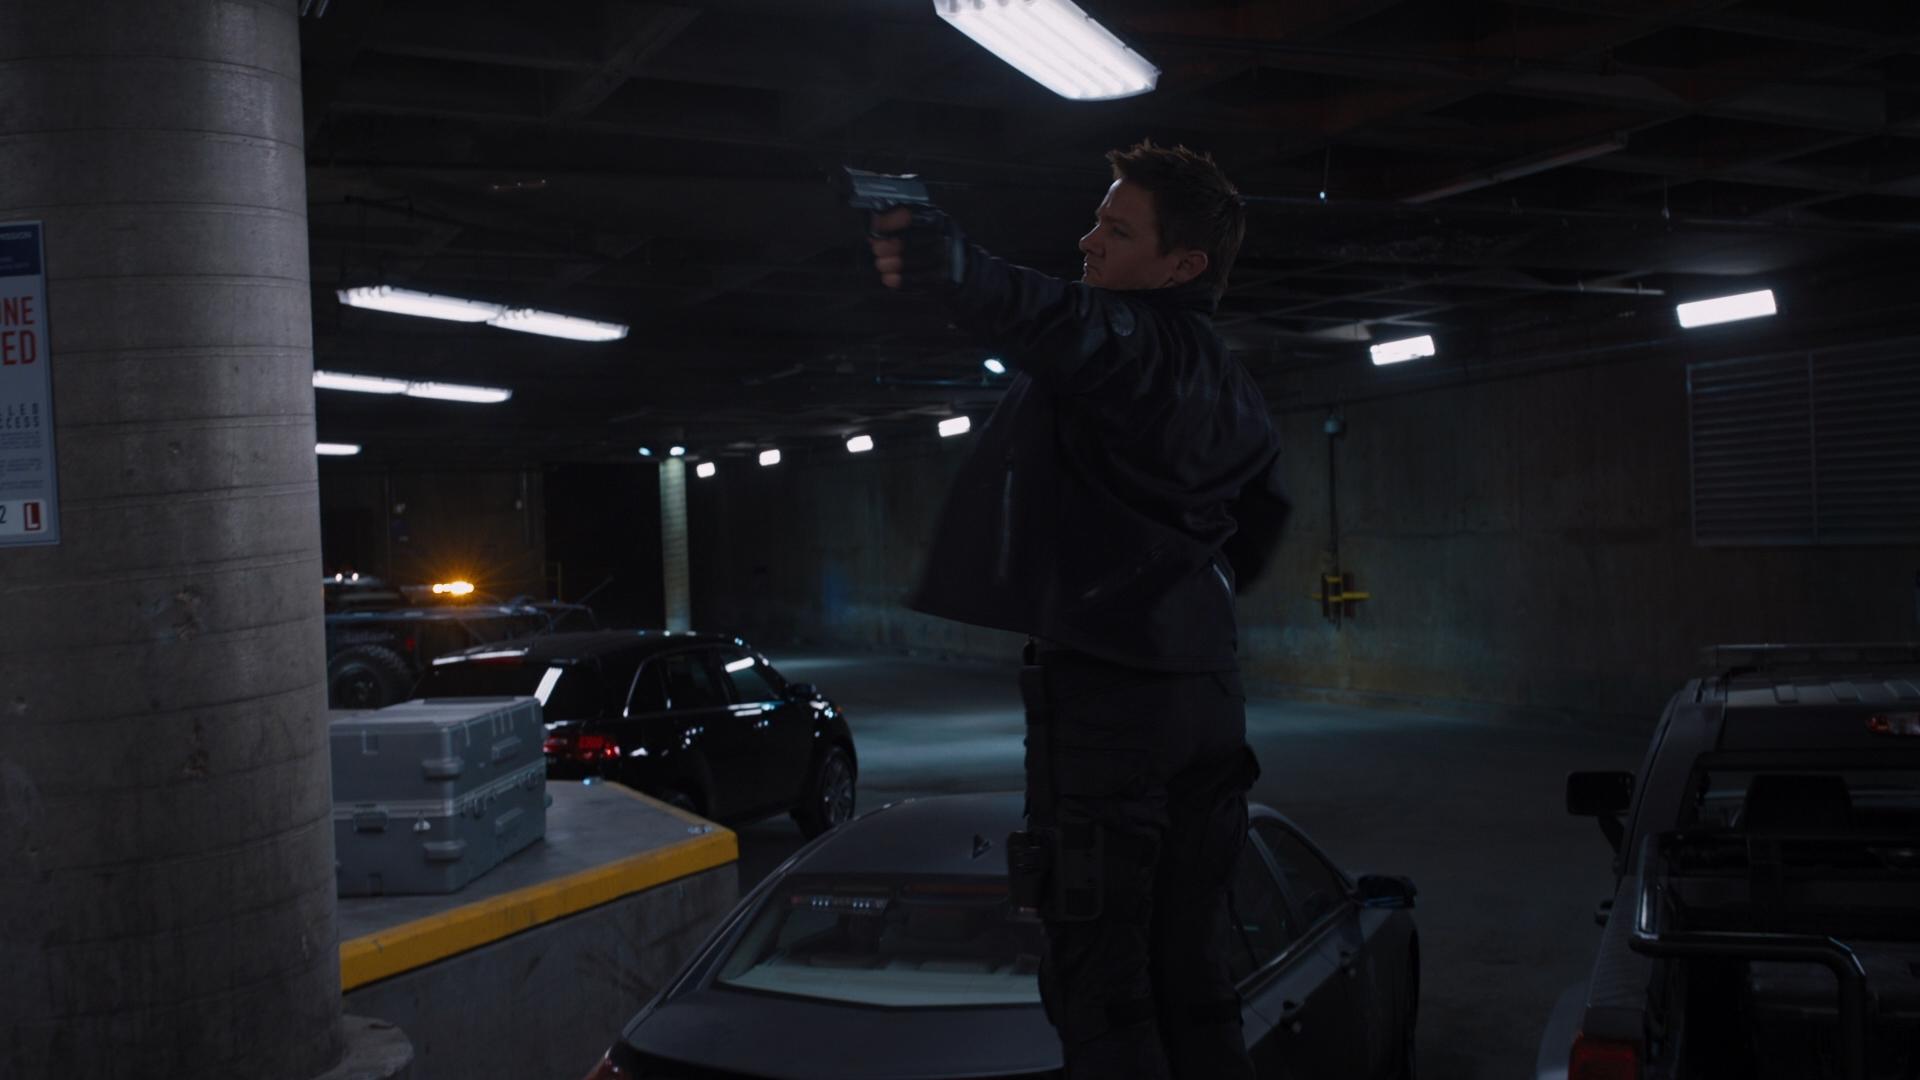 THE AVENGERS (2012) - Hawkeye's (Jeremy Renner) H&K P30 Stunt Pistol - Image 9 of 10